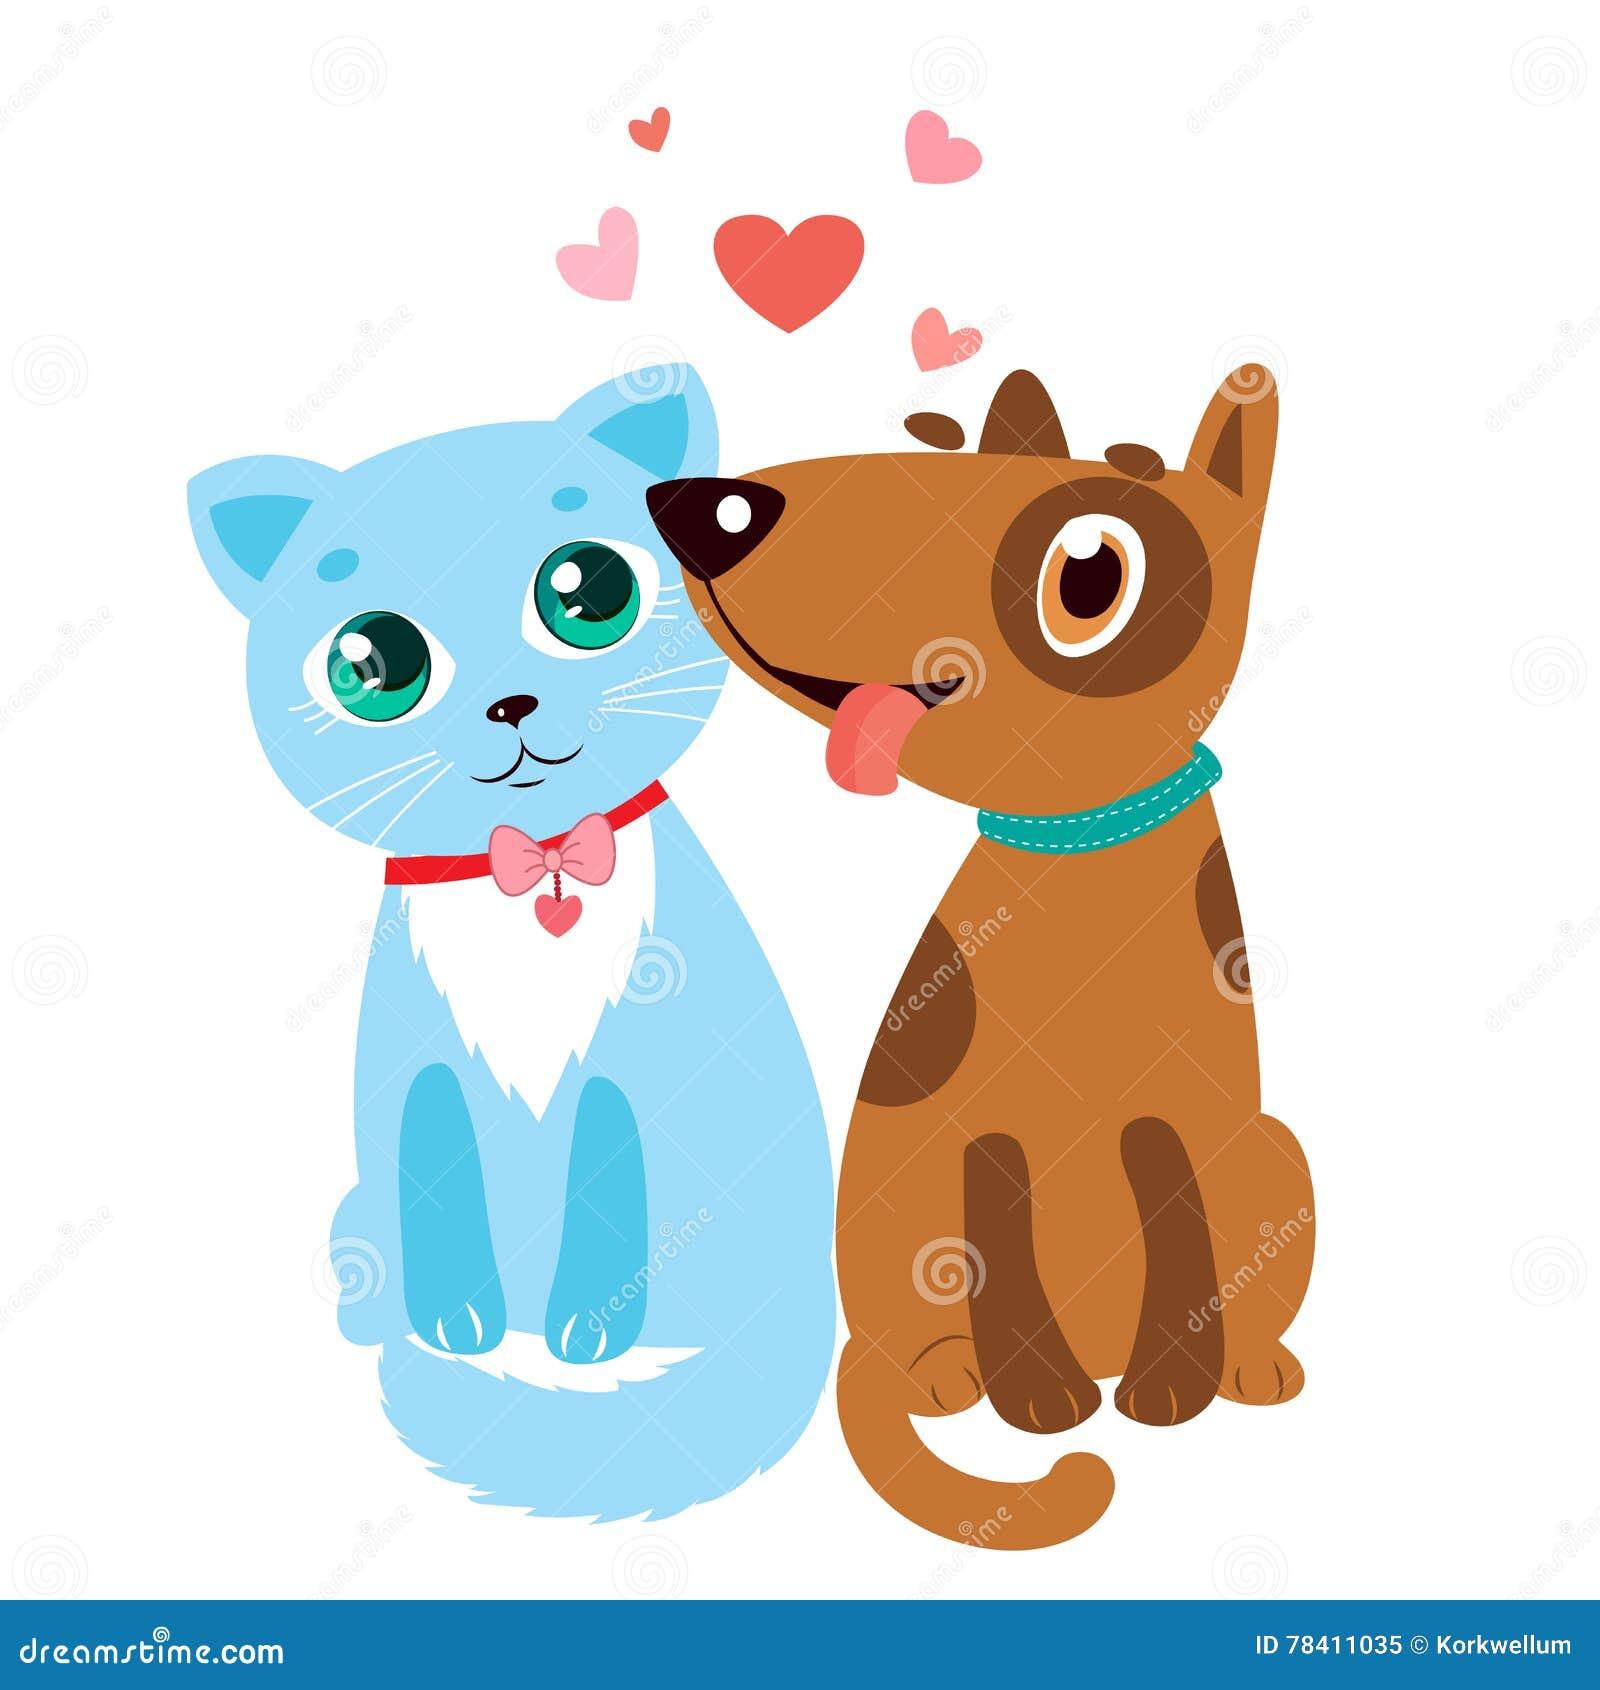 Cat Dog Friendship Stock Illustrations 3 290 Cat Dog Friendship Stock Illustrations Vectors Clipart Dreamstime